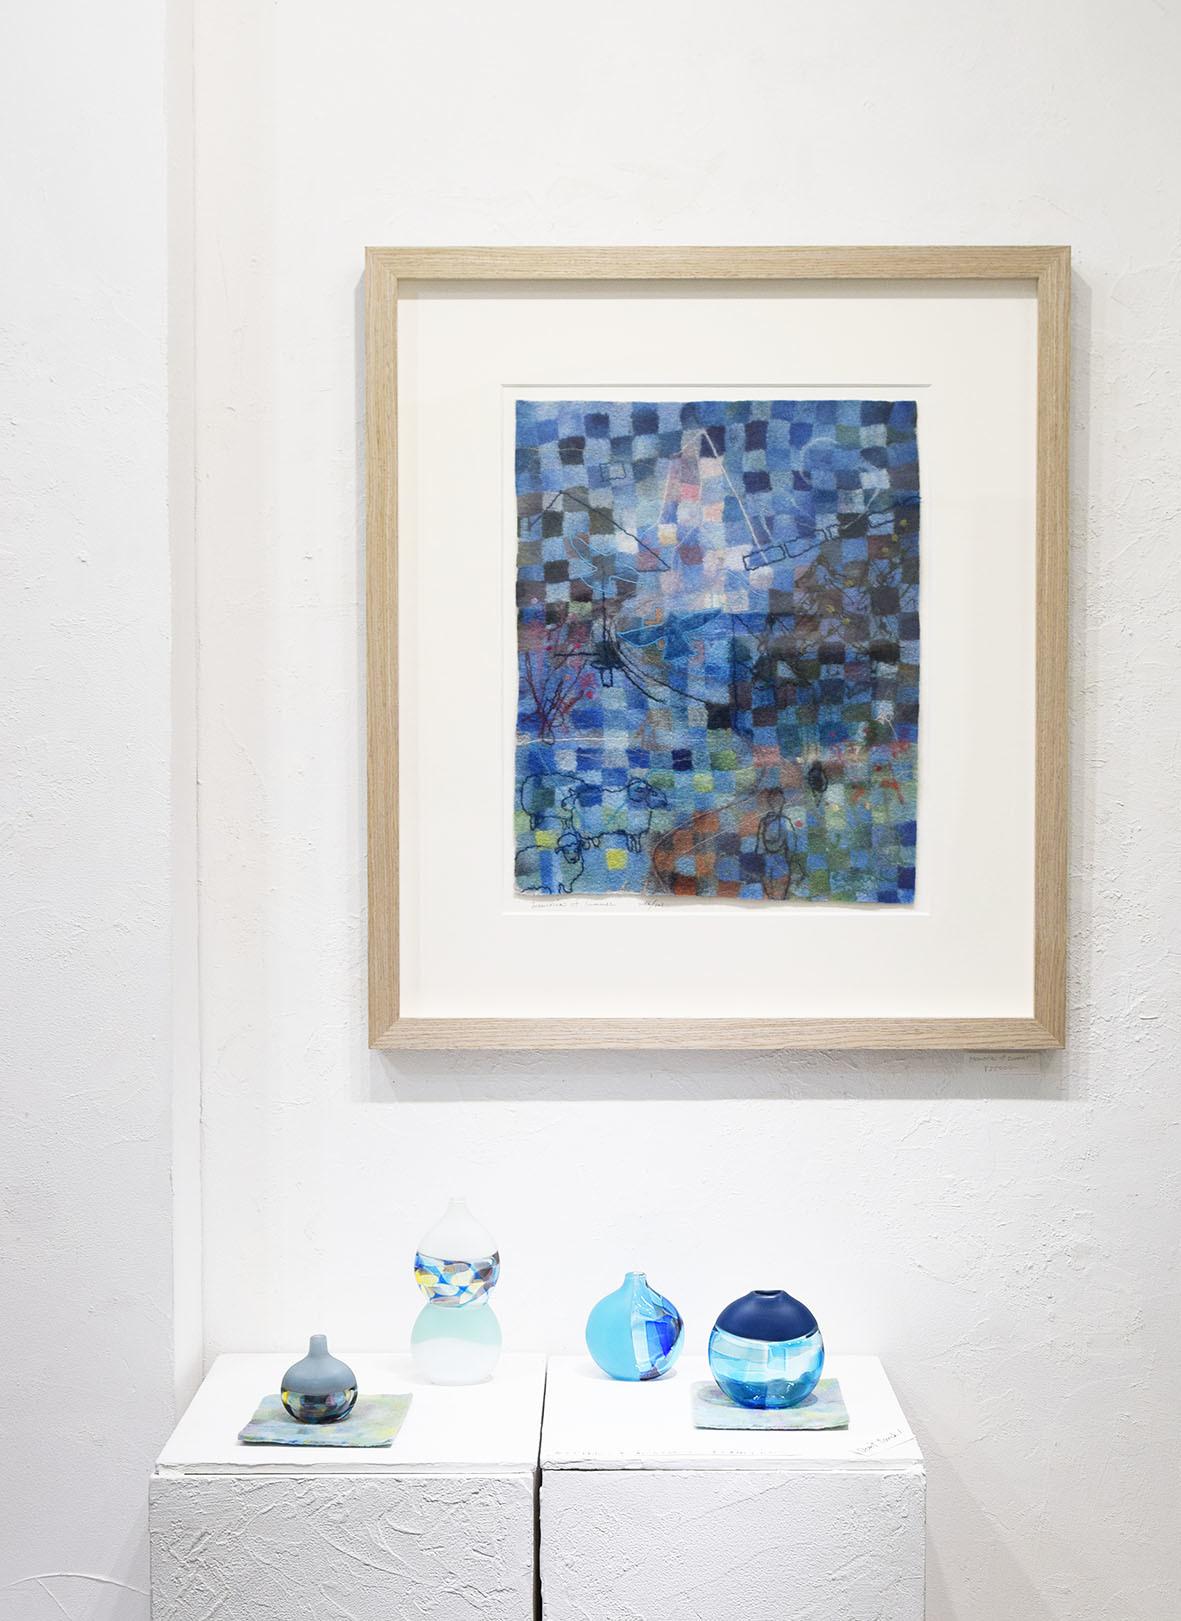 MOSAIC FELT Kokuga Rumi exhibition @ 5日目_e0272050_16565459.jpg